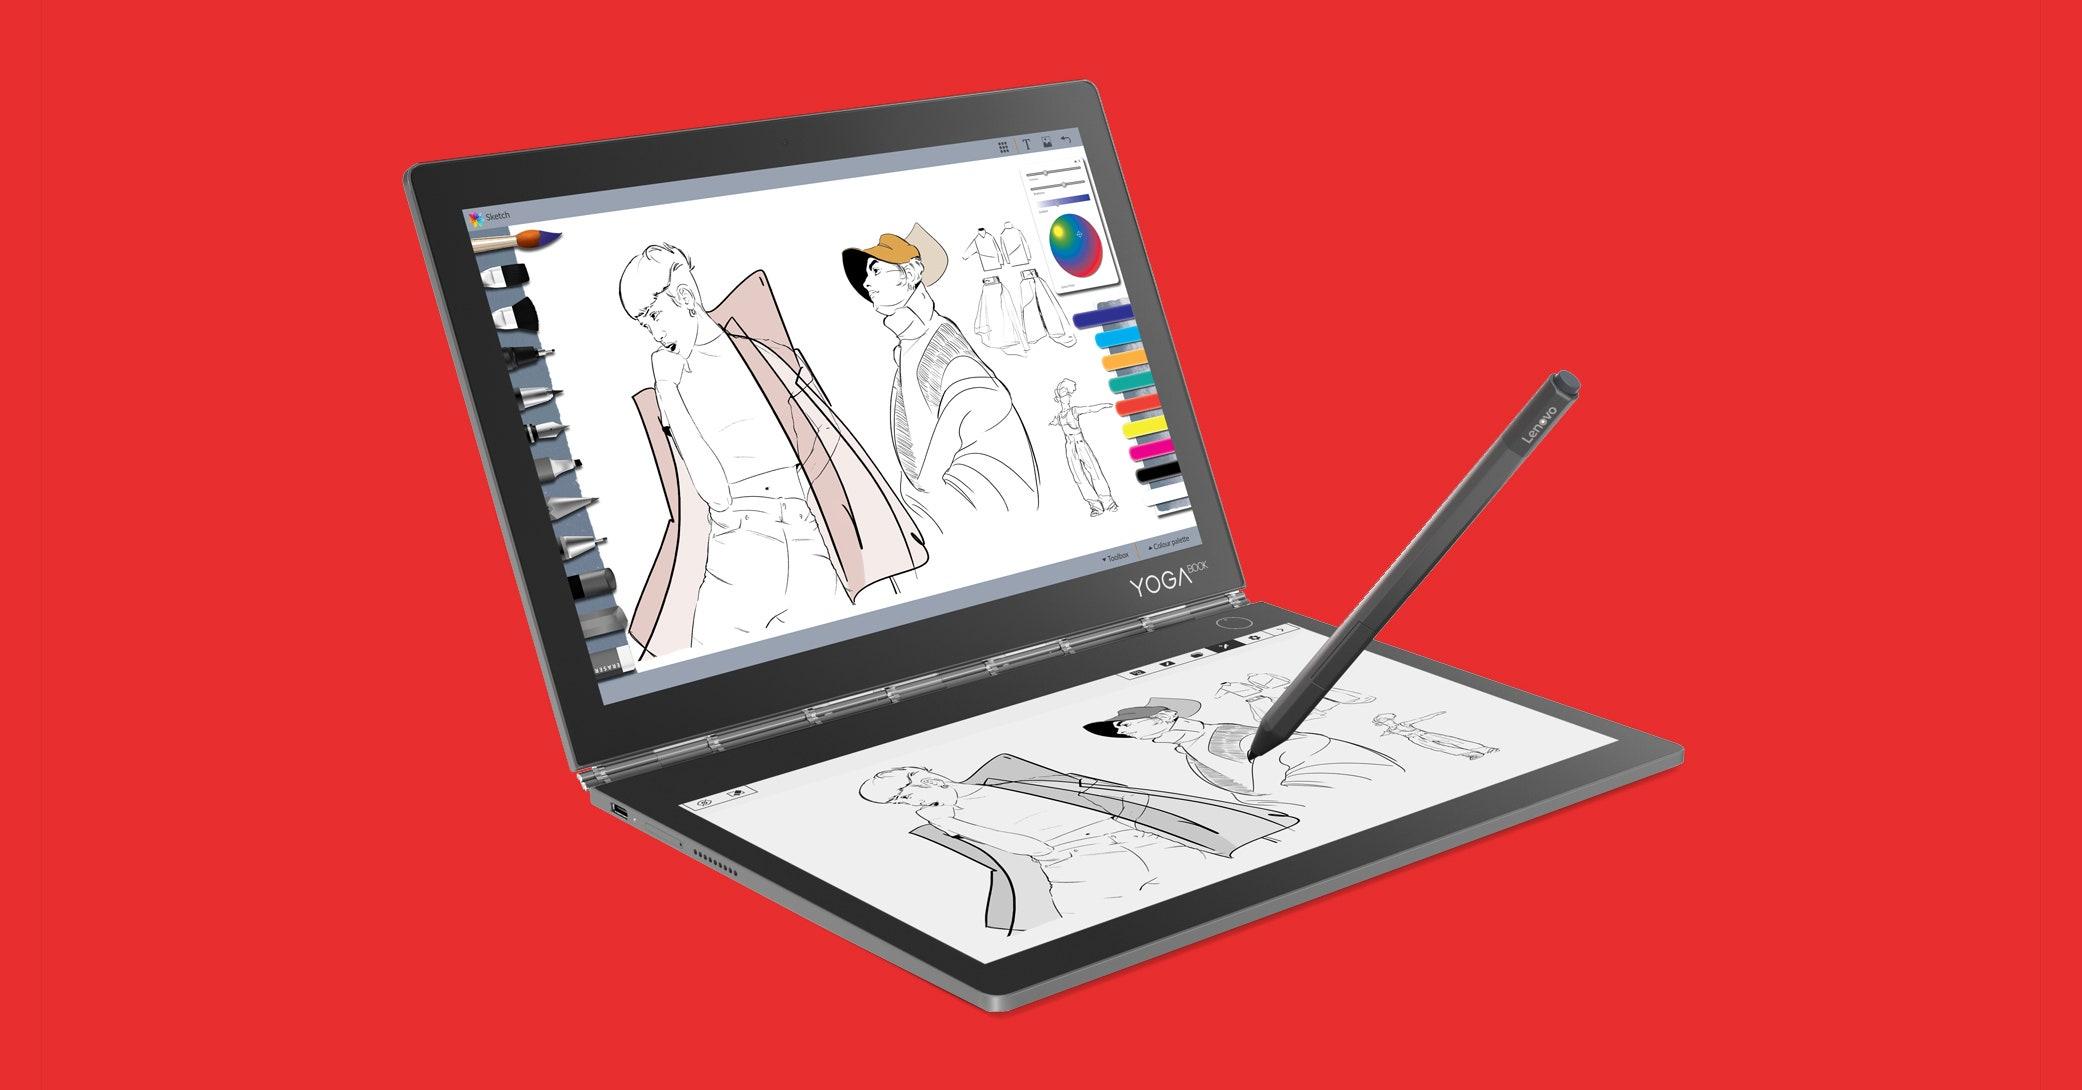 1d878dfcb41 Lenovo s Yoga Book C930 Redefines a Travel Laptop